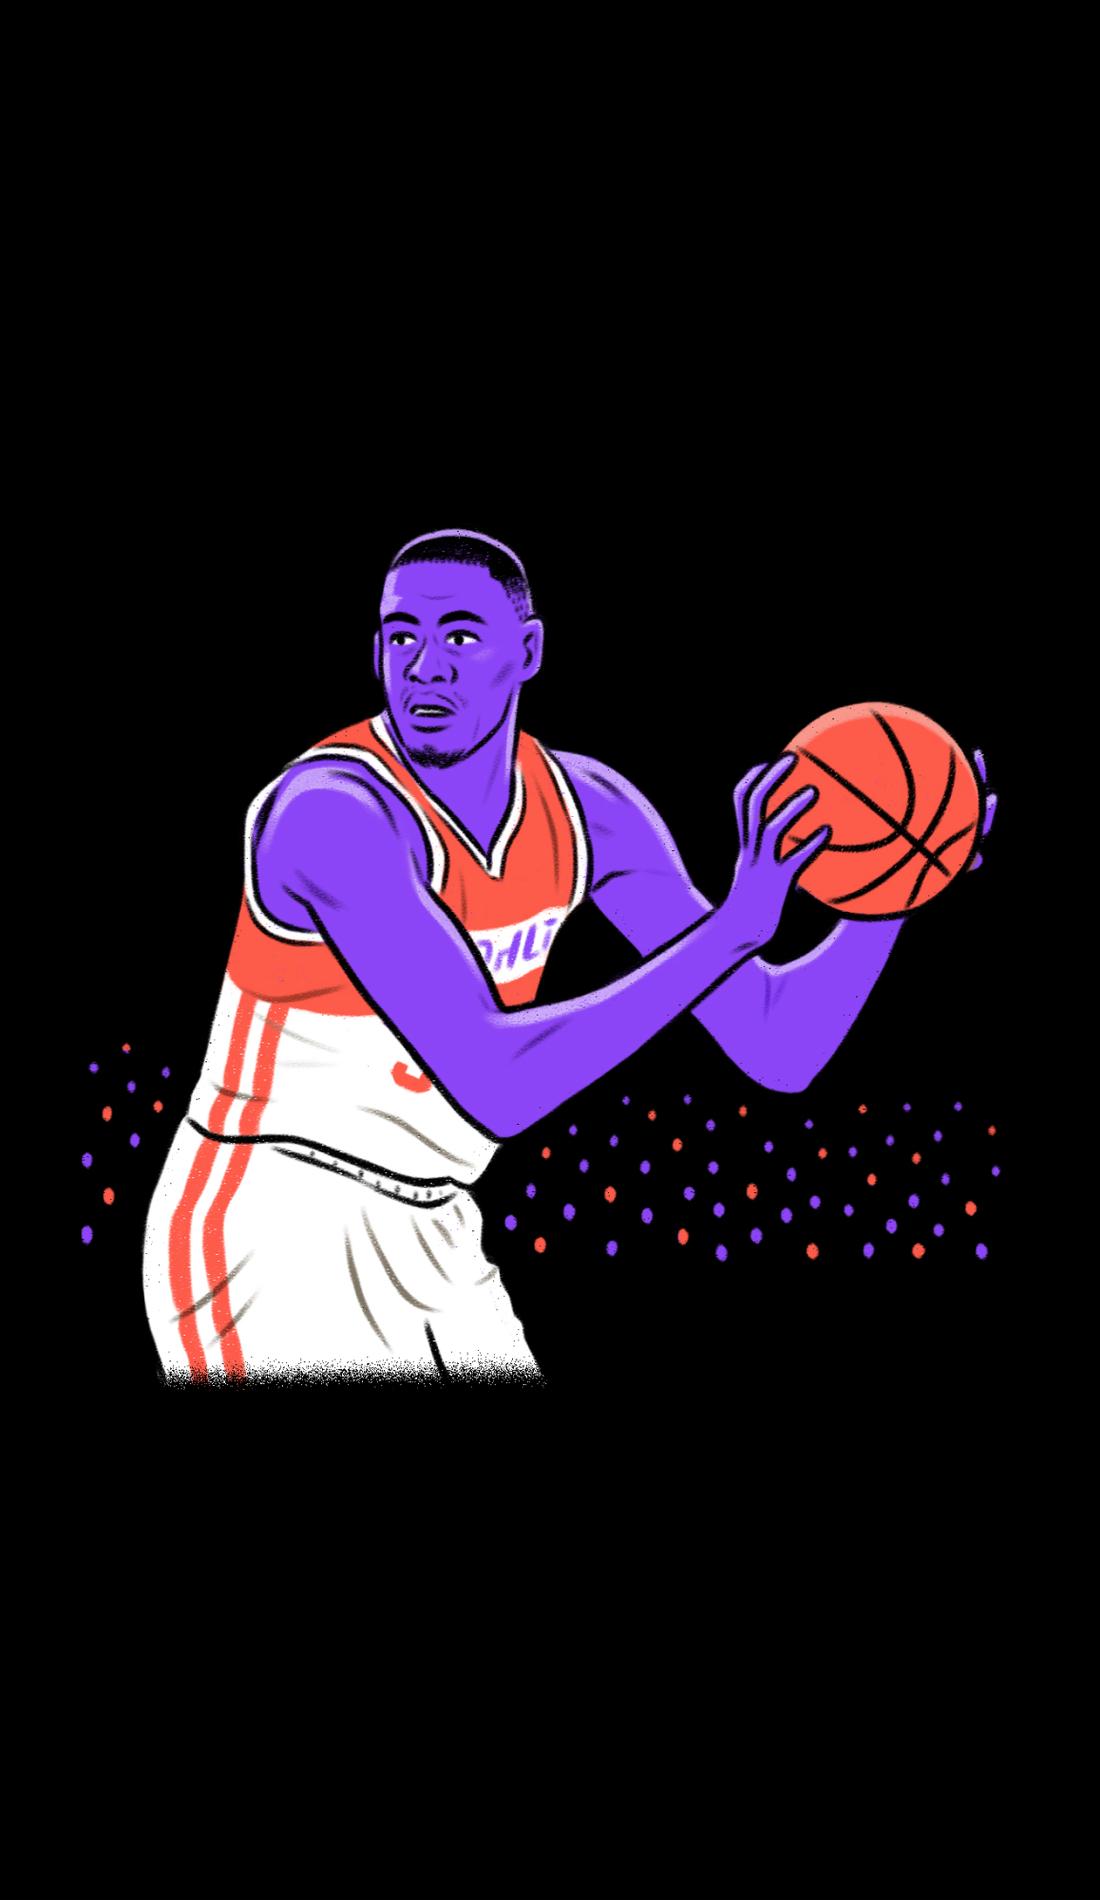 A Arizona Wildcats Basketball live event